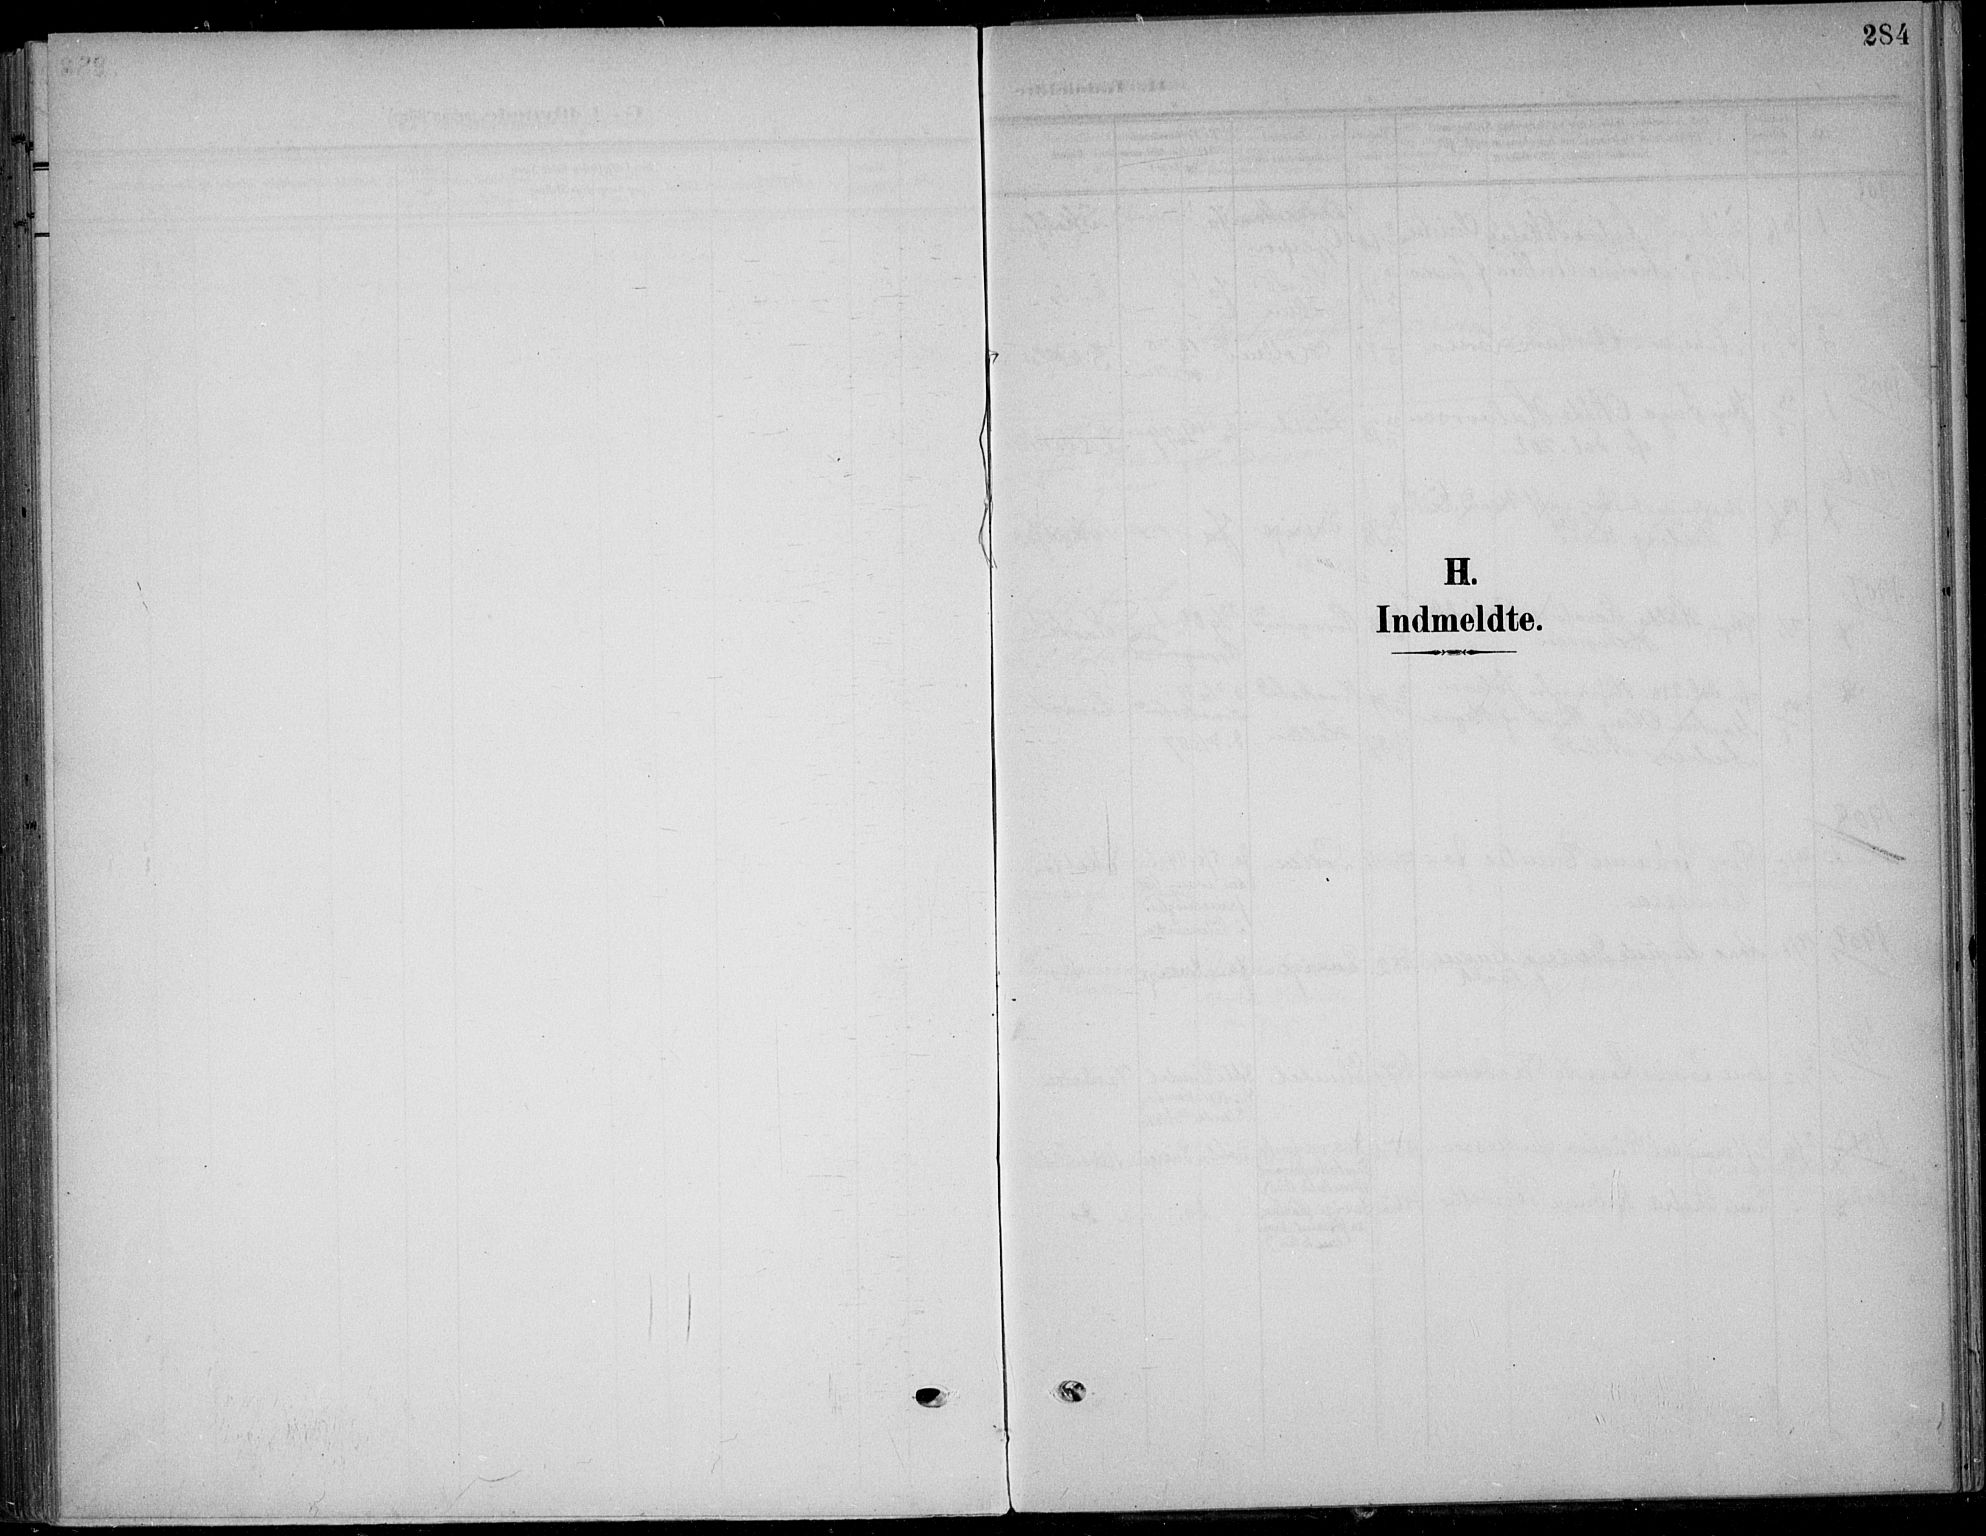 SAKO, Solum kirkebøker, F/Fb/L0003: Ministerialbok nr. II 3, 1901-1912, s. 284